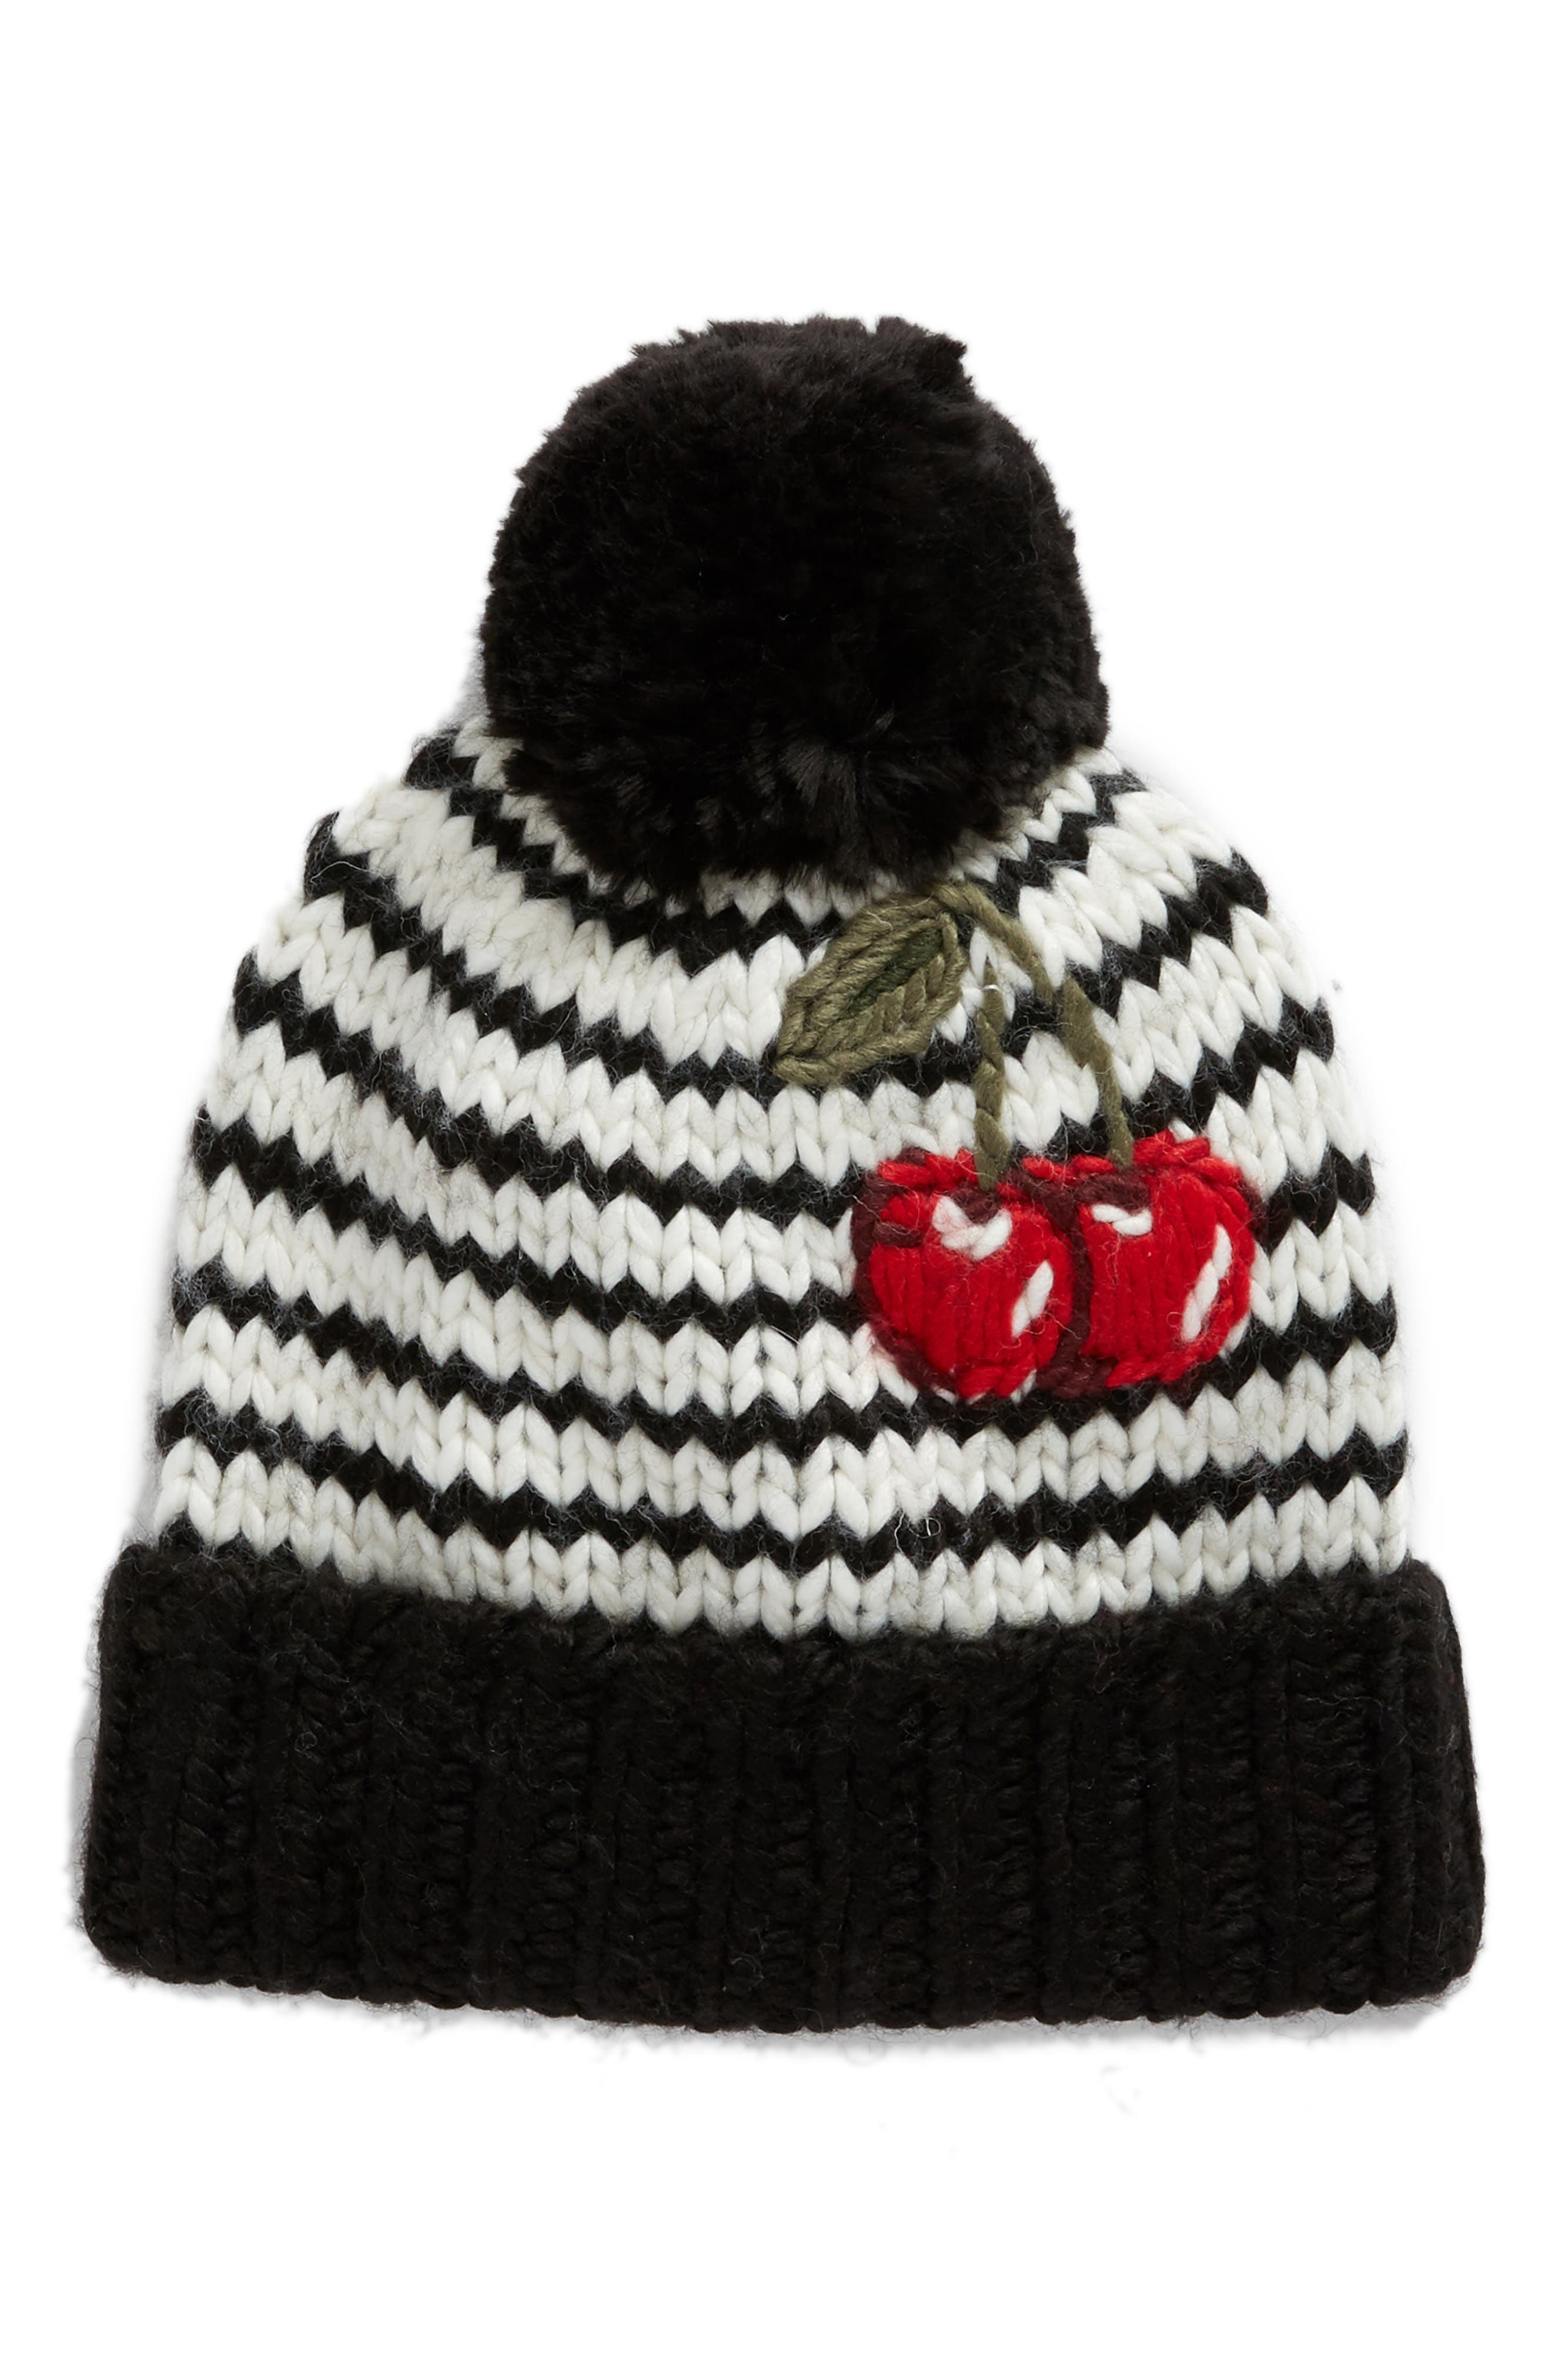 Alternate Image 1 Selected - kate spade new york ma cherie hand knit pom beanie